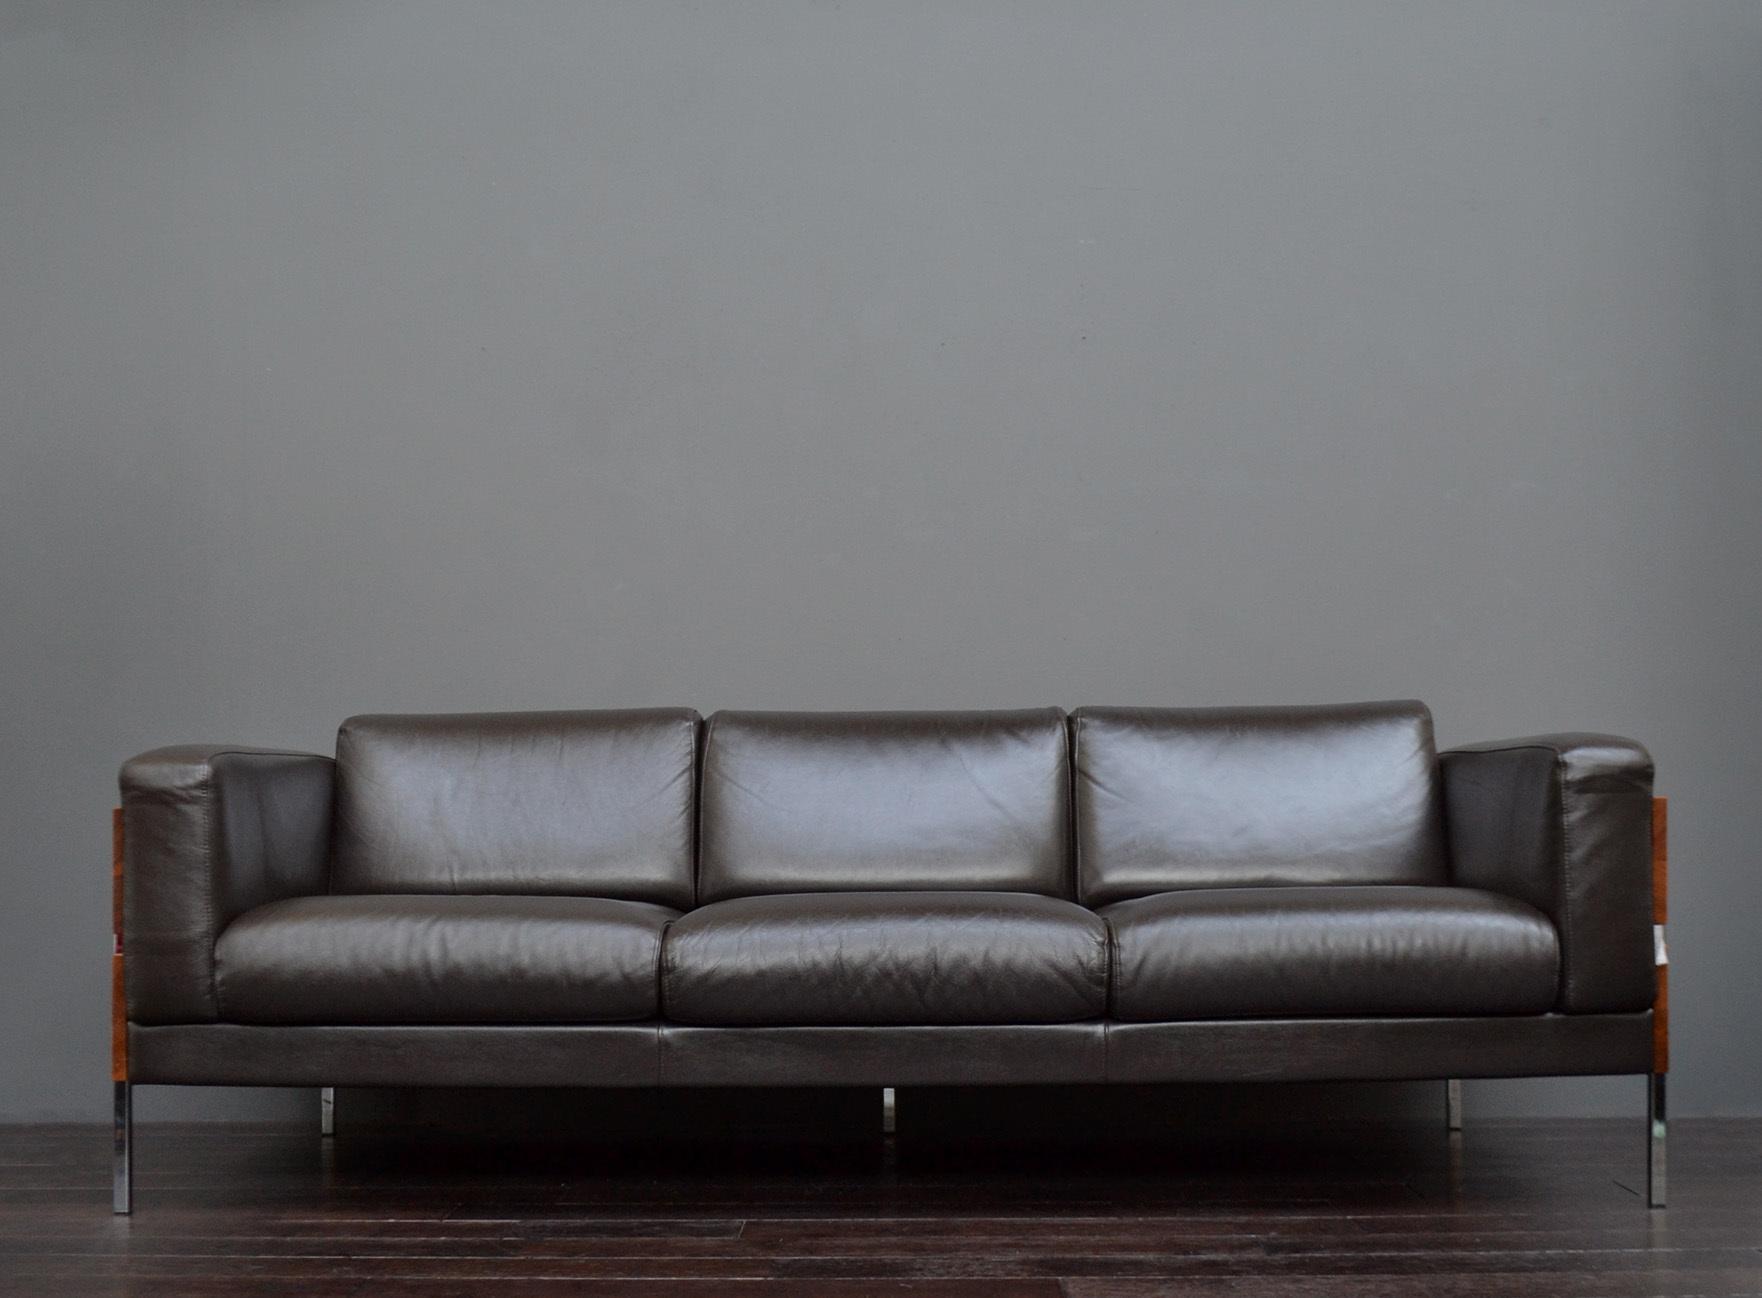 Phenomenal Original Mid Century Design Forum Dark Brown Leather Sofa By Robin Day For Habitat Ibusinesslaw Wood Chair Design Ideas Ibusinesslaworg